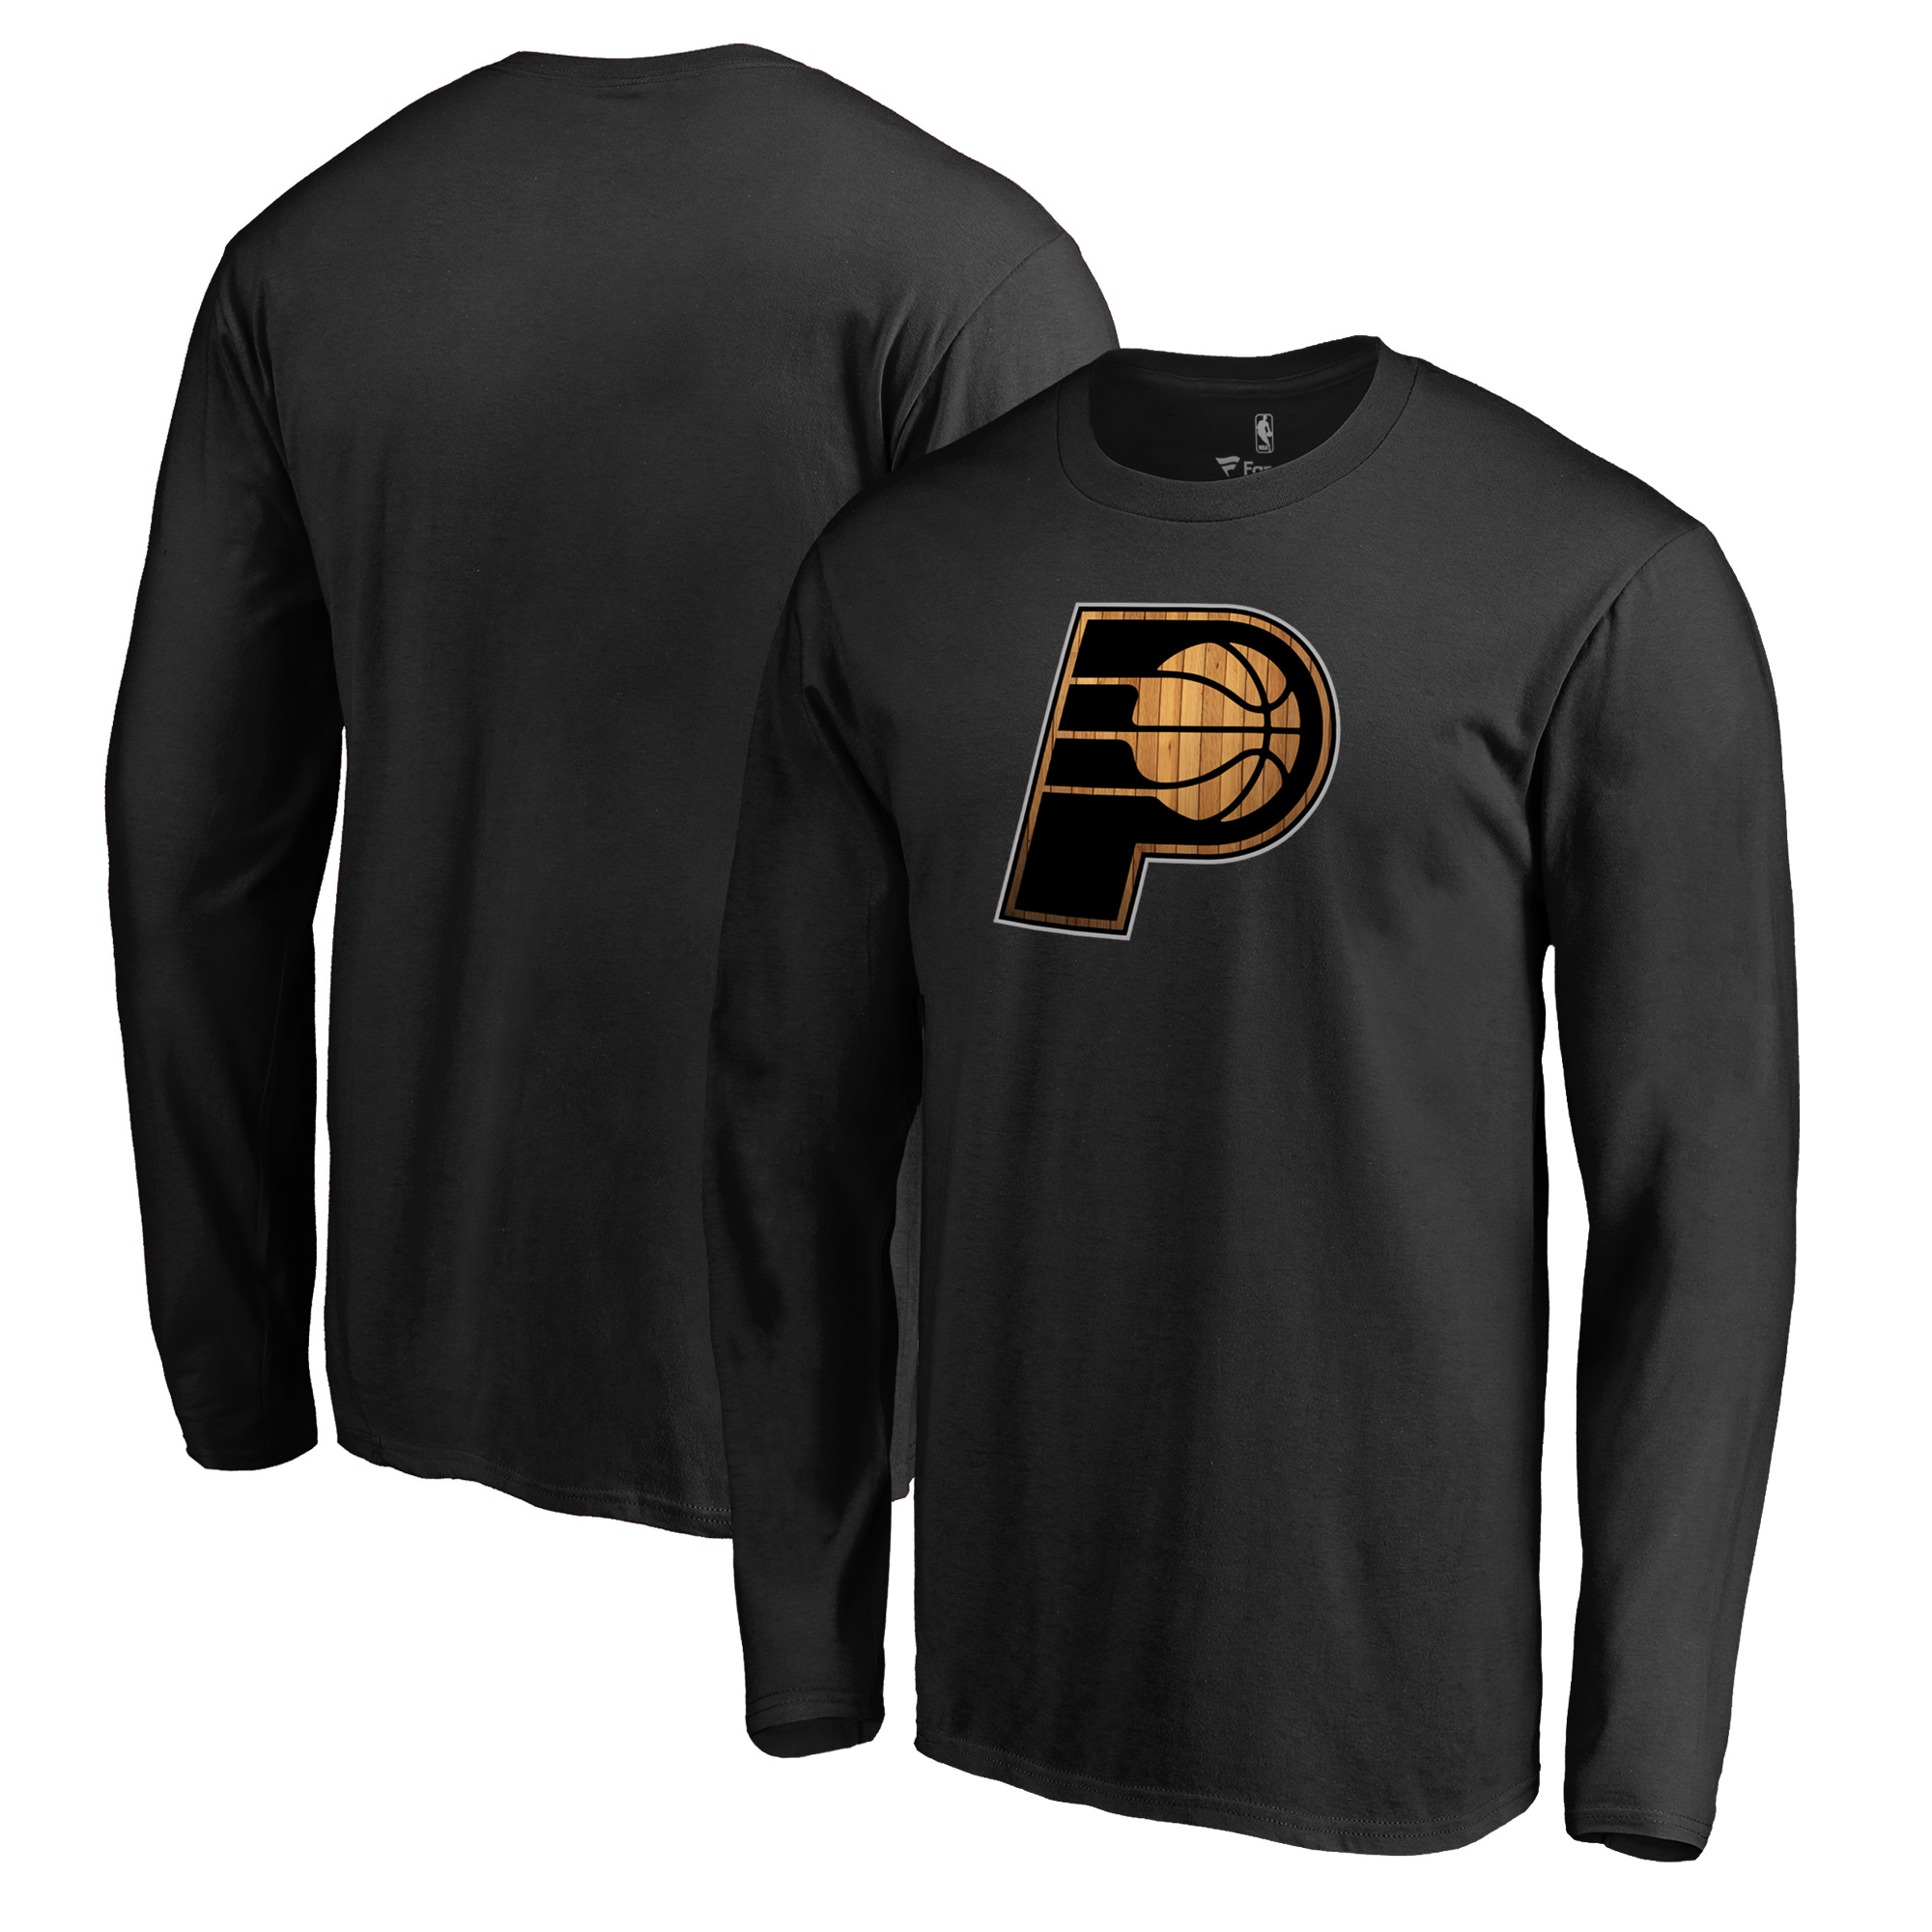 Indiana Pacers Fanatics Branded Hardwood Big & Tall Long Sleeve T-Shirt - Black